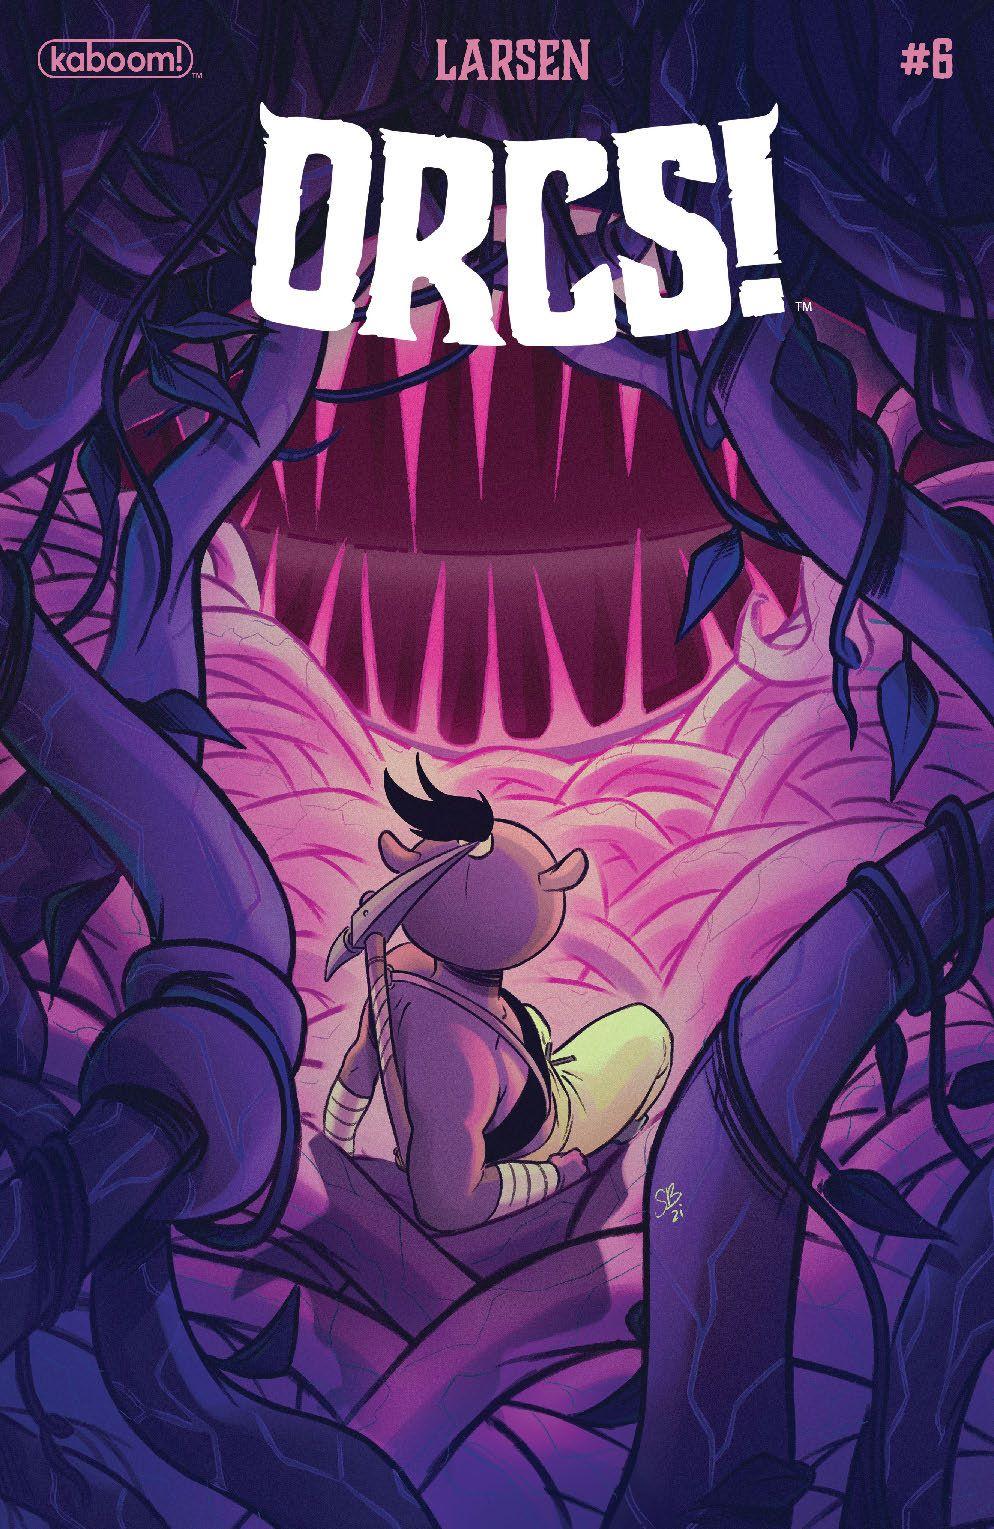 Orcs_006_Cover_B_Variant ComicList Previews: ORCS #6 (OF 6)